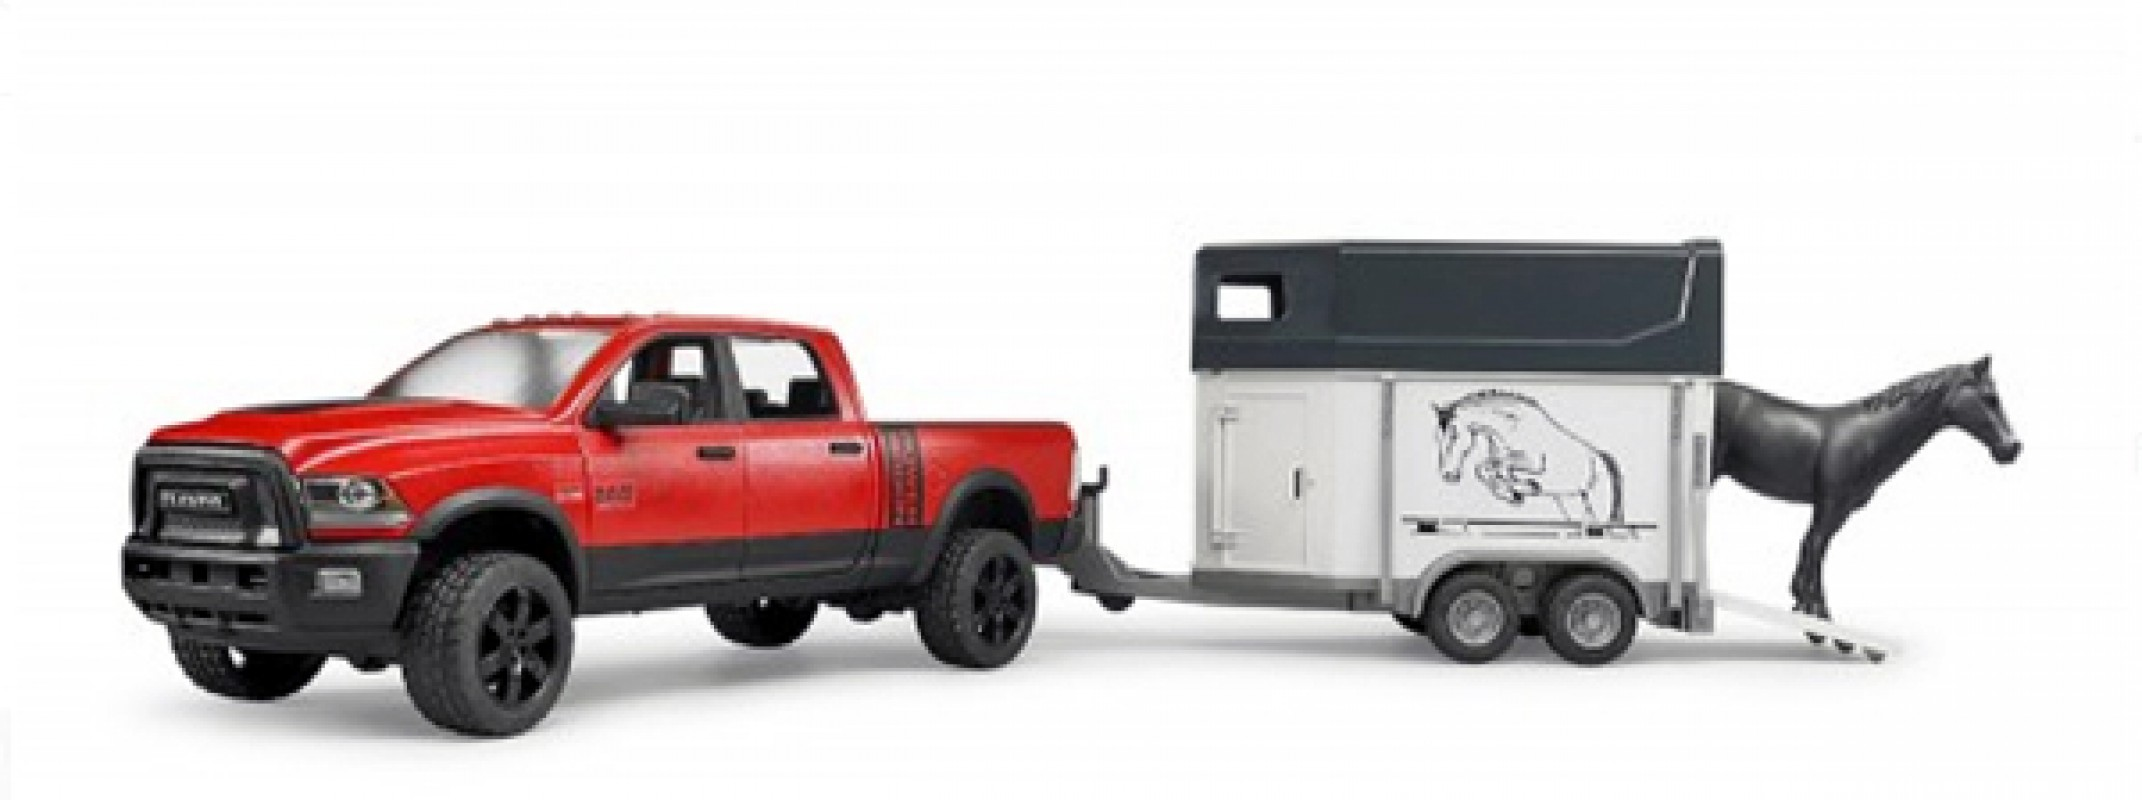 bruder profi serie dodge power wagon met paard en. Black Bedroom Furniture Sets. Home Design Ideas